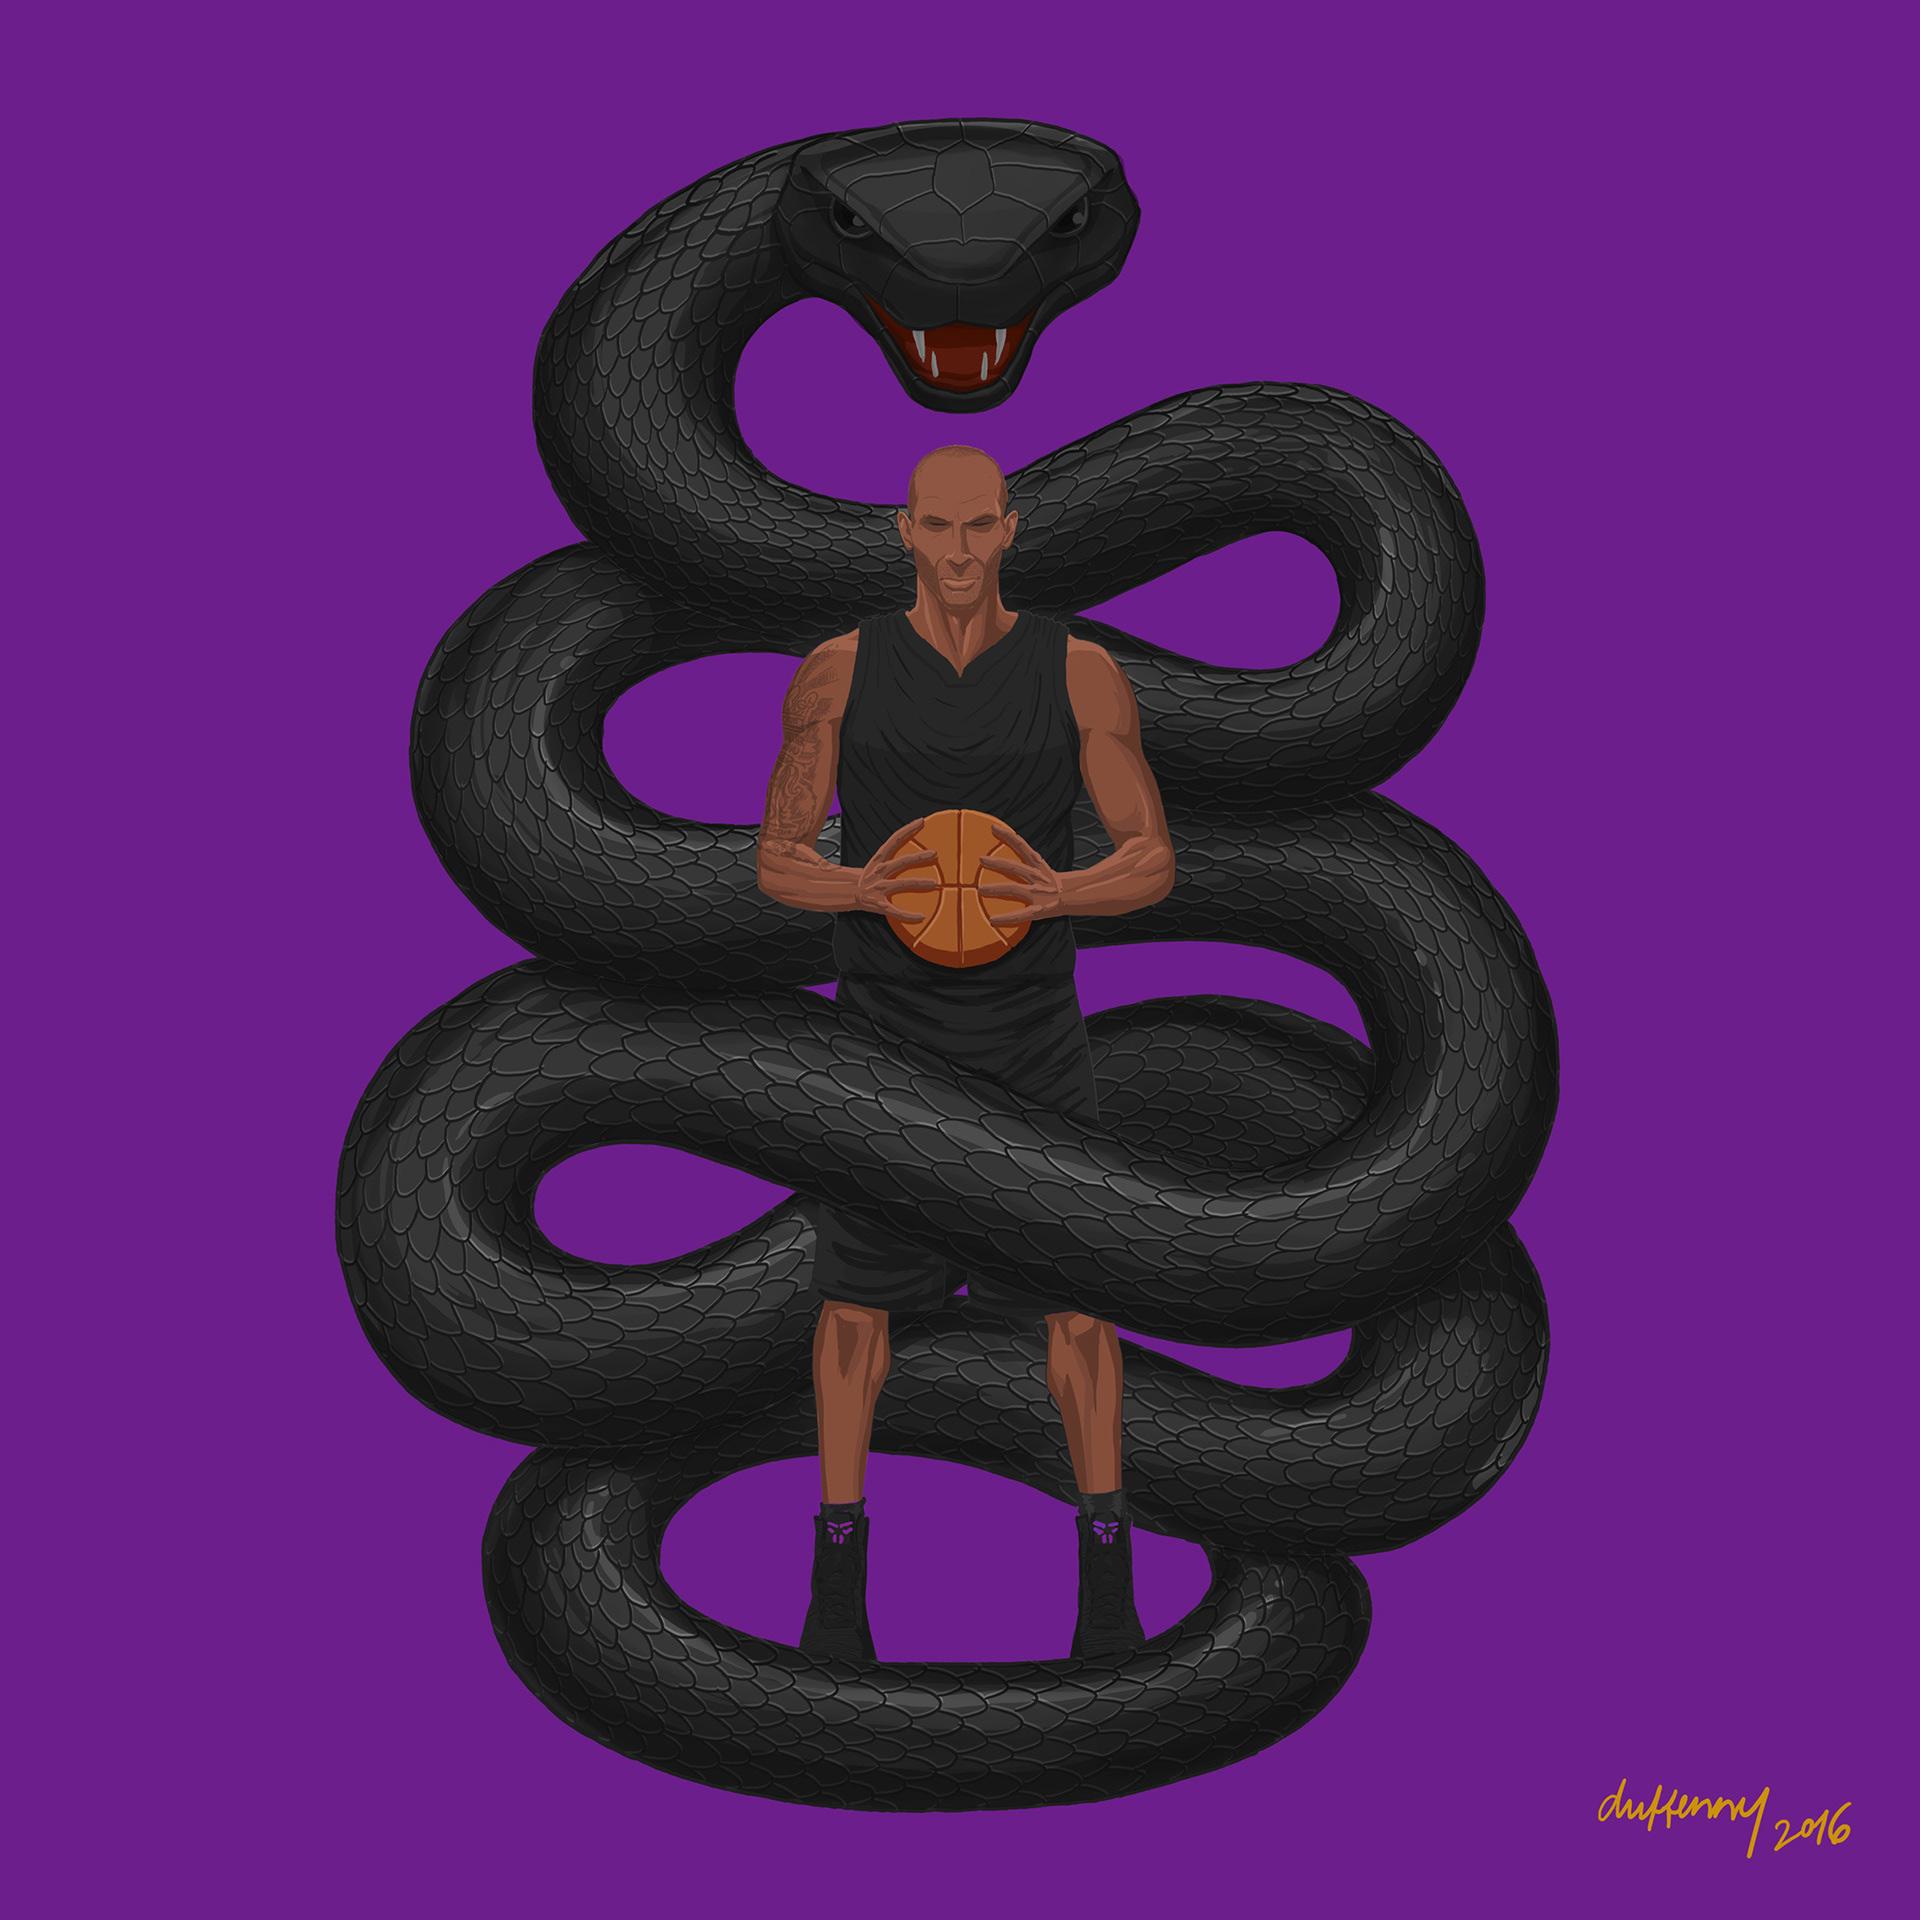 black mamba принца гамбит